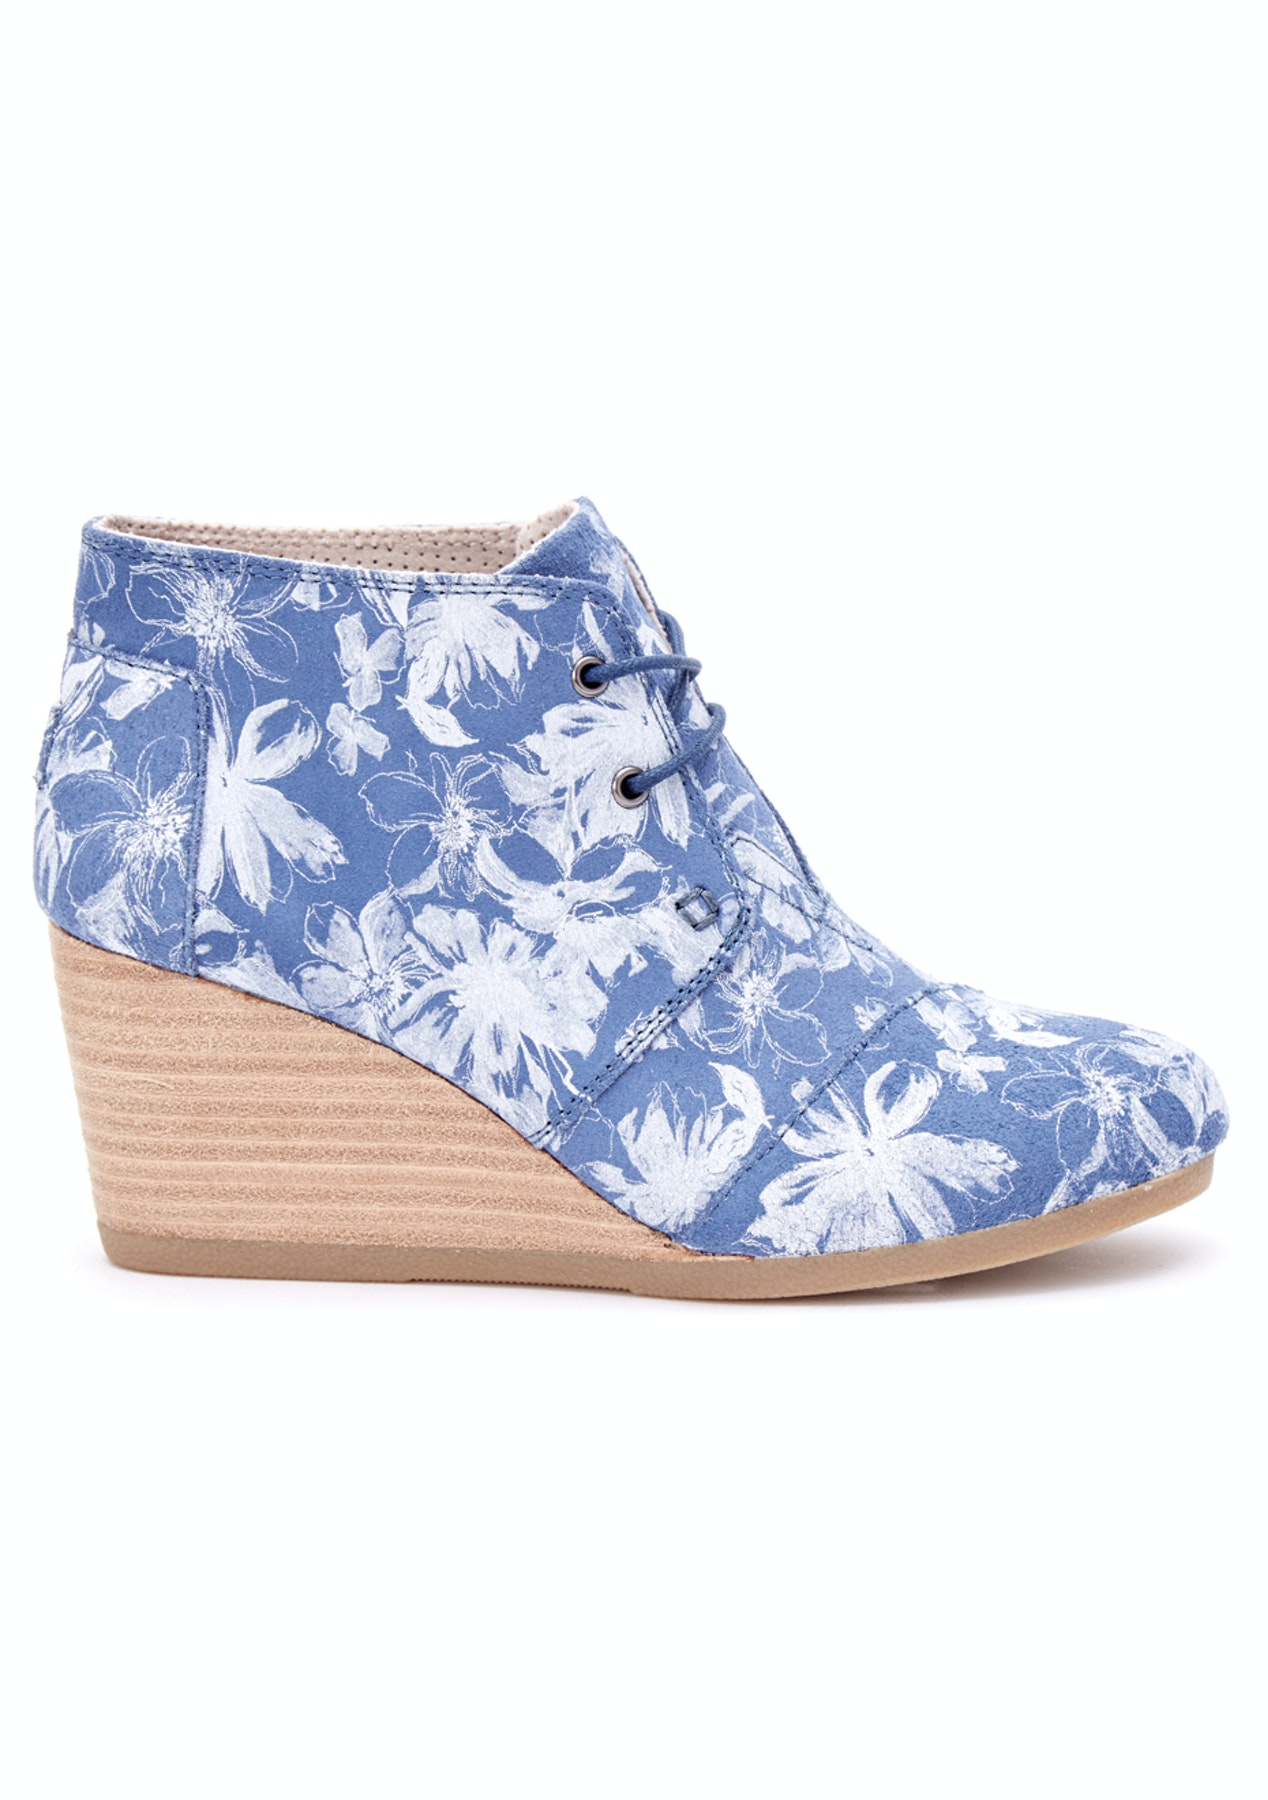 4573c9acc137 Toms - Desert Wedge - Blue Suede Floral - Toms Shoes - Onceit